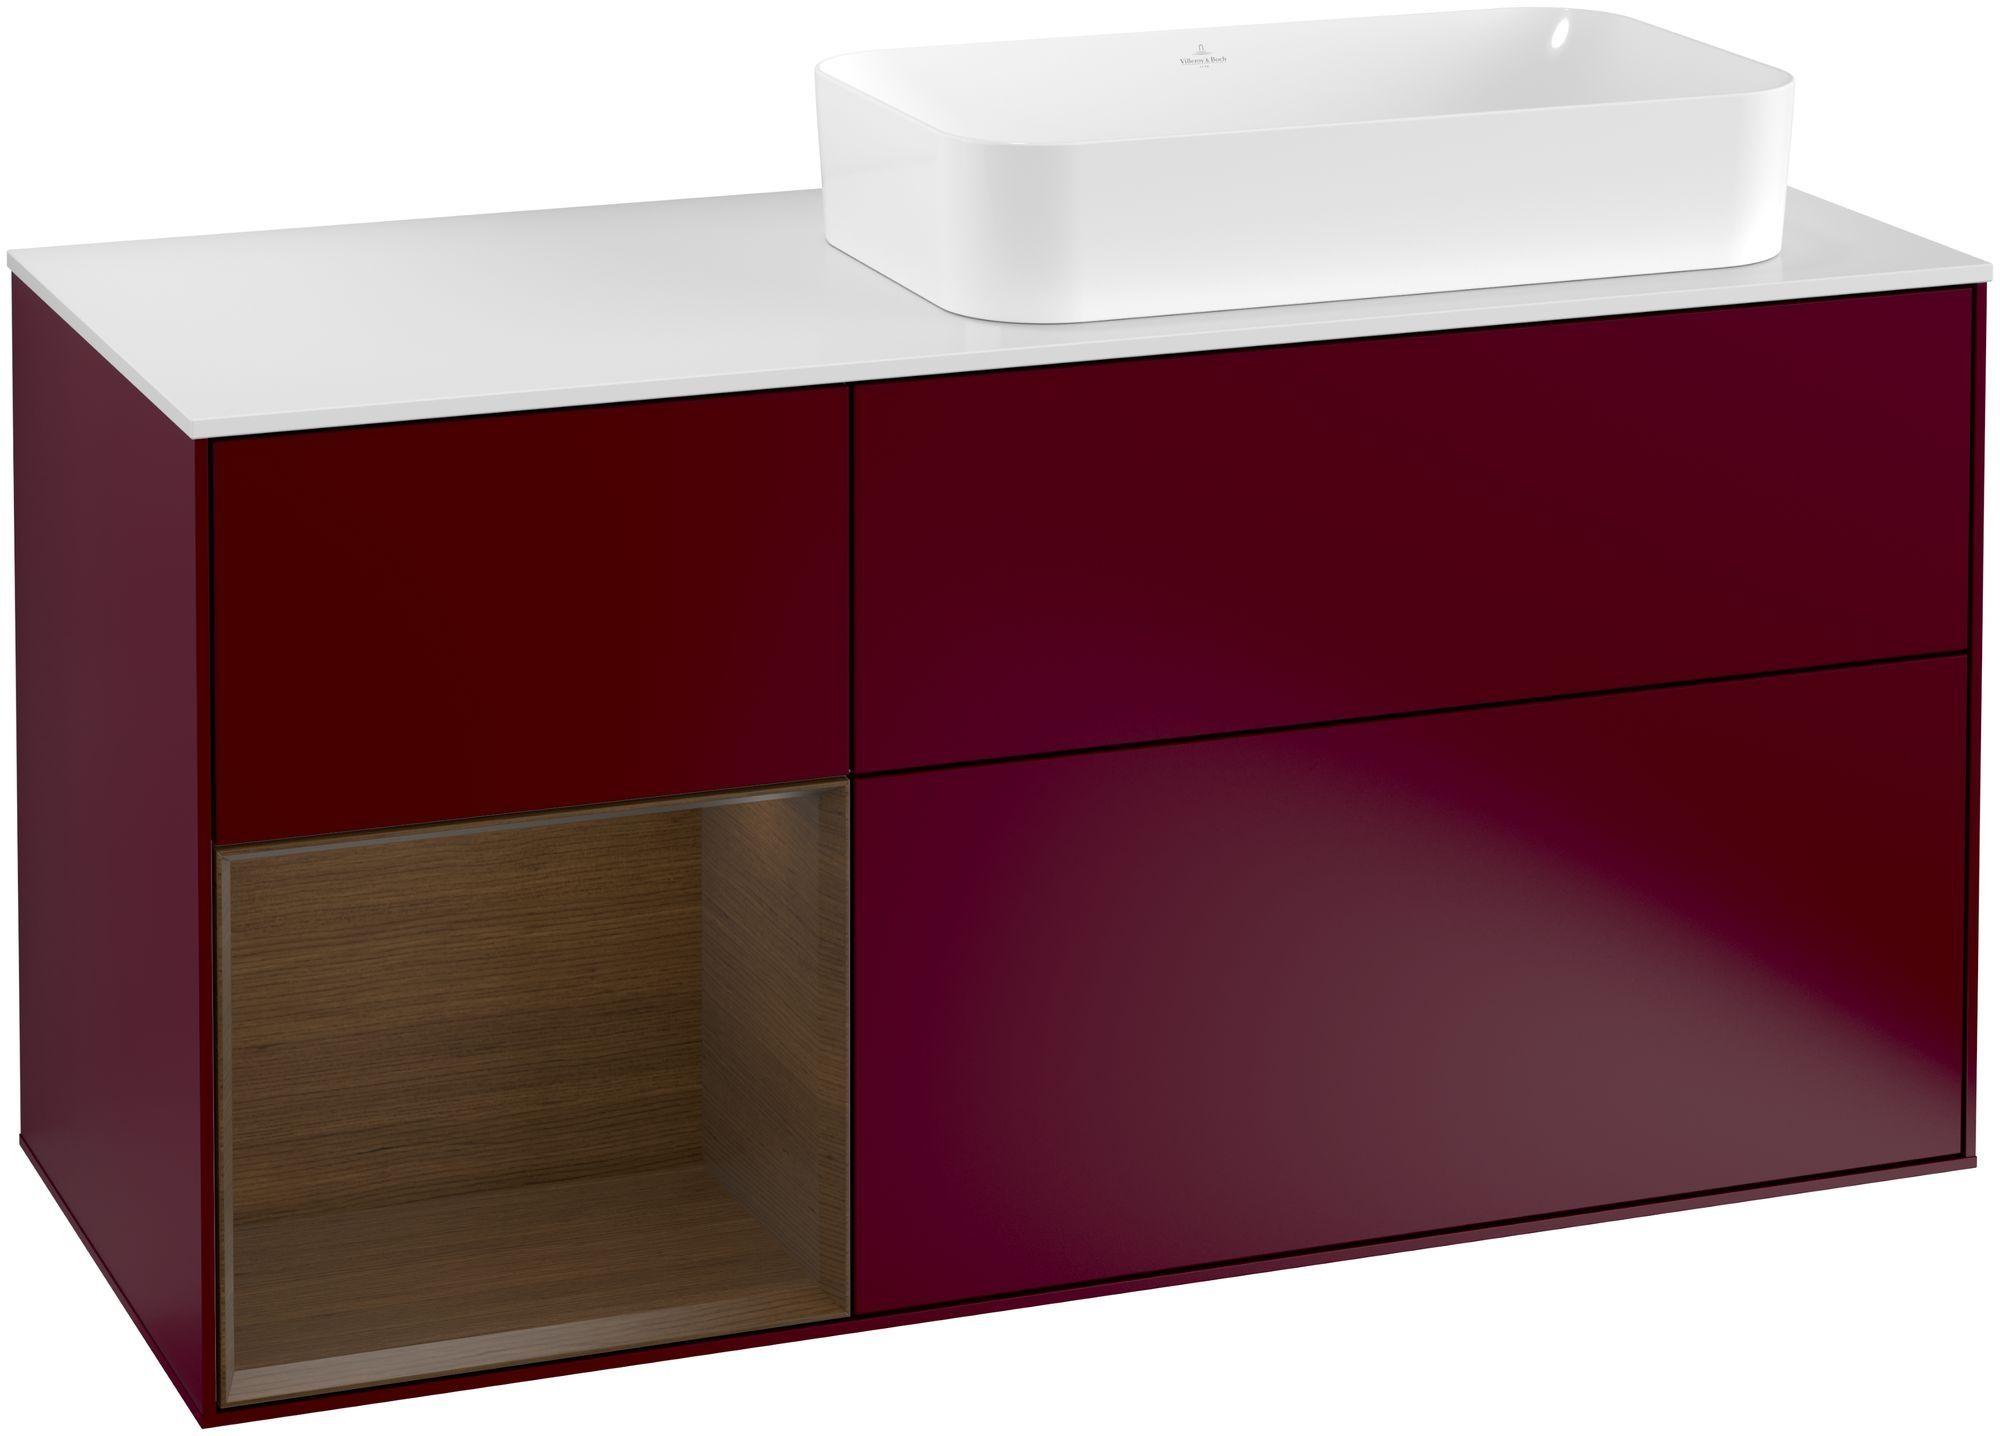 Villeroy & Boch Finion F27 Waschtischunterschrank mit Regalelement 3 Auszüge Waschtisch rechts LED-Beleuchtung B:120xH:60,3xT:50,1cm Front, Korpus: Peony, Regal: Walnut Veneer, Glasplatte: White Matt F271GNHB